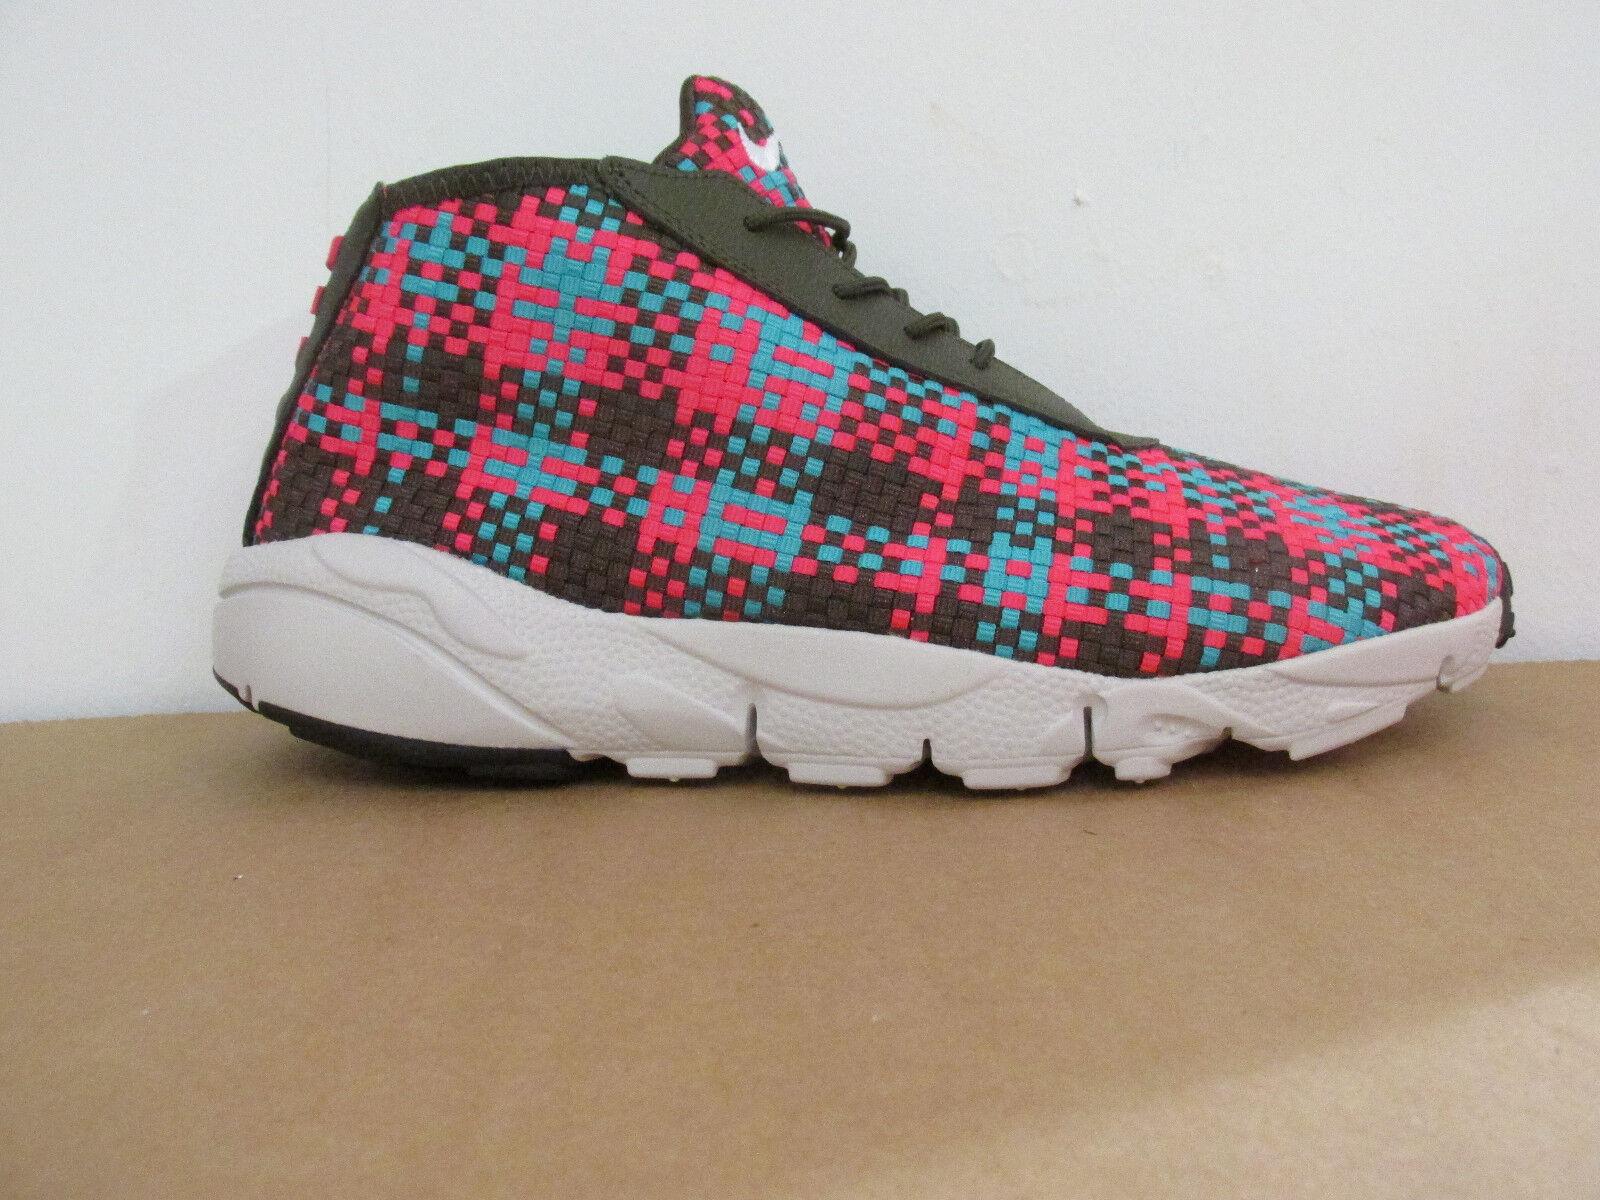 64e44906bce3 ... nike air footscape desert chukka chukka chukka mens trainers 652822 300  sneakers CLEARANCE 0177a2 ...